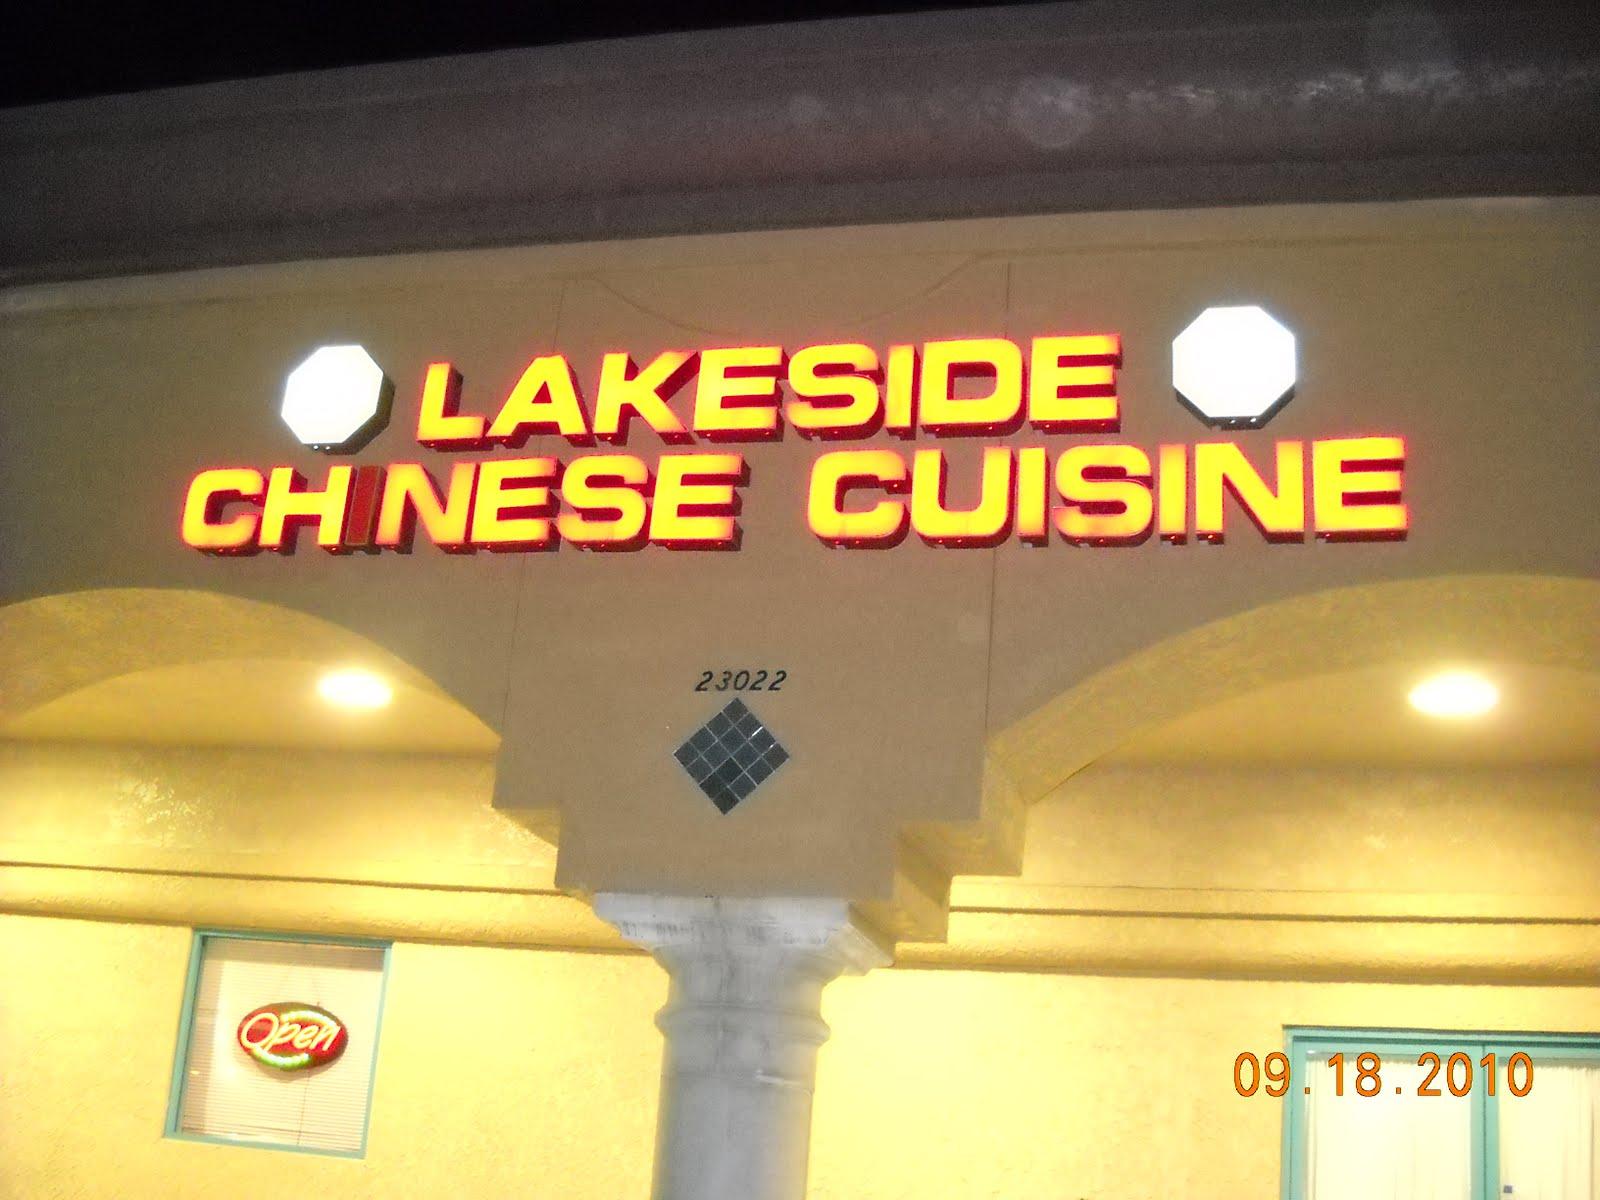 Crown Chinese Restaurant Mission Viejo